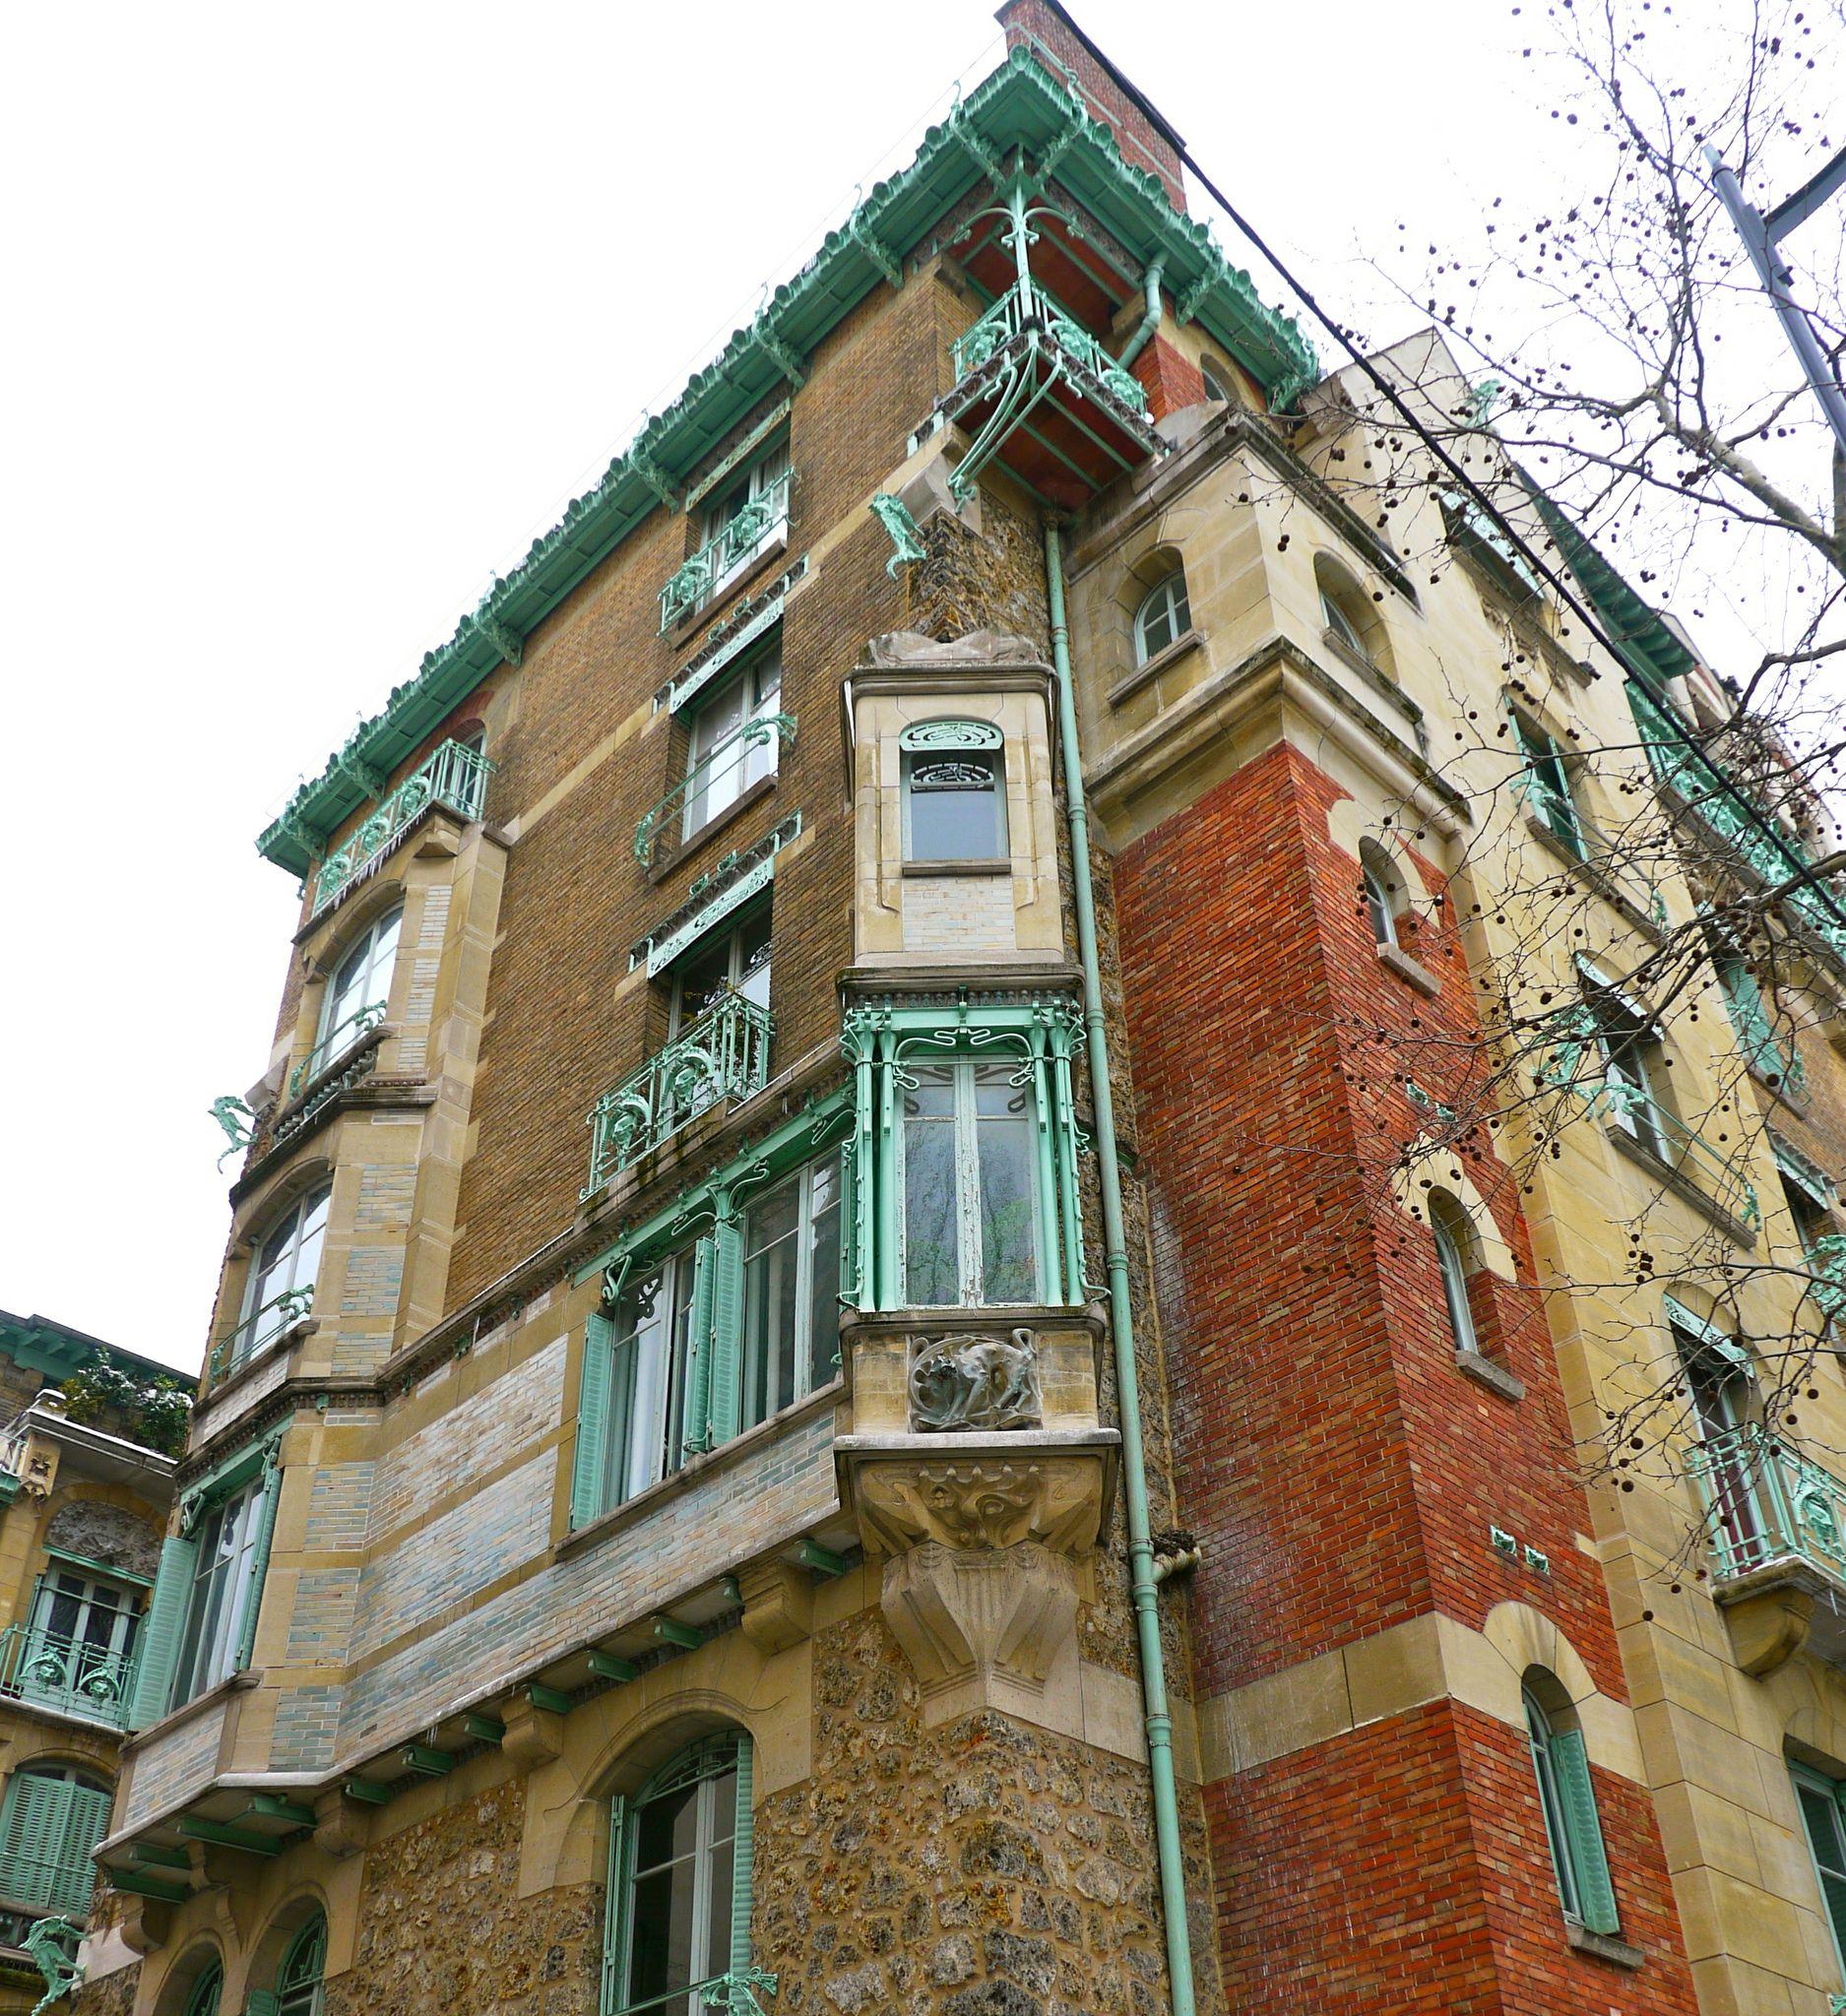 Paris, rue Jean de La Fontaine, Castel Béranger, Hector